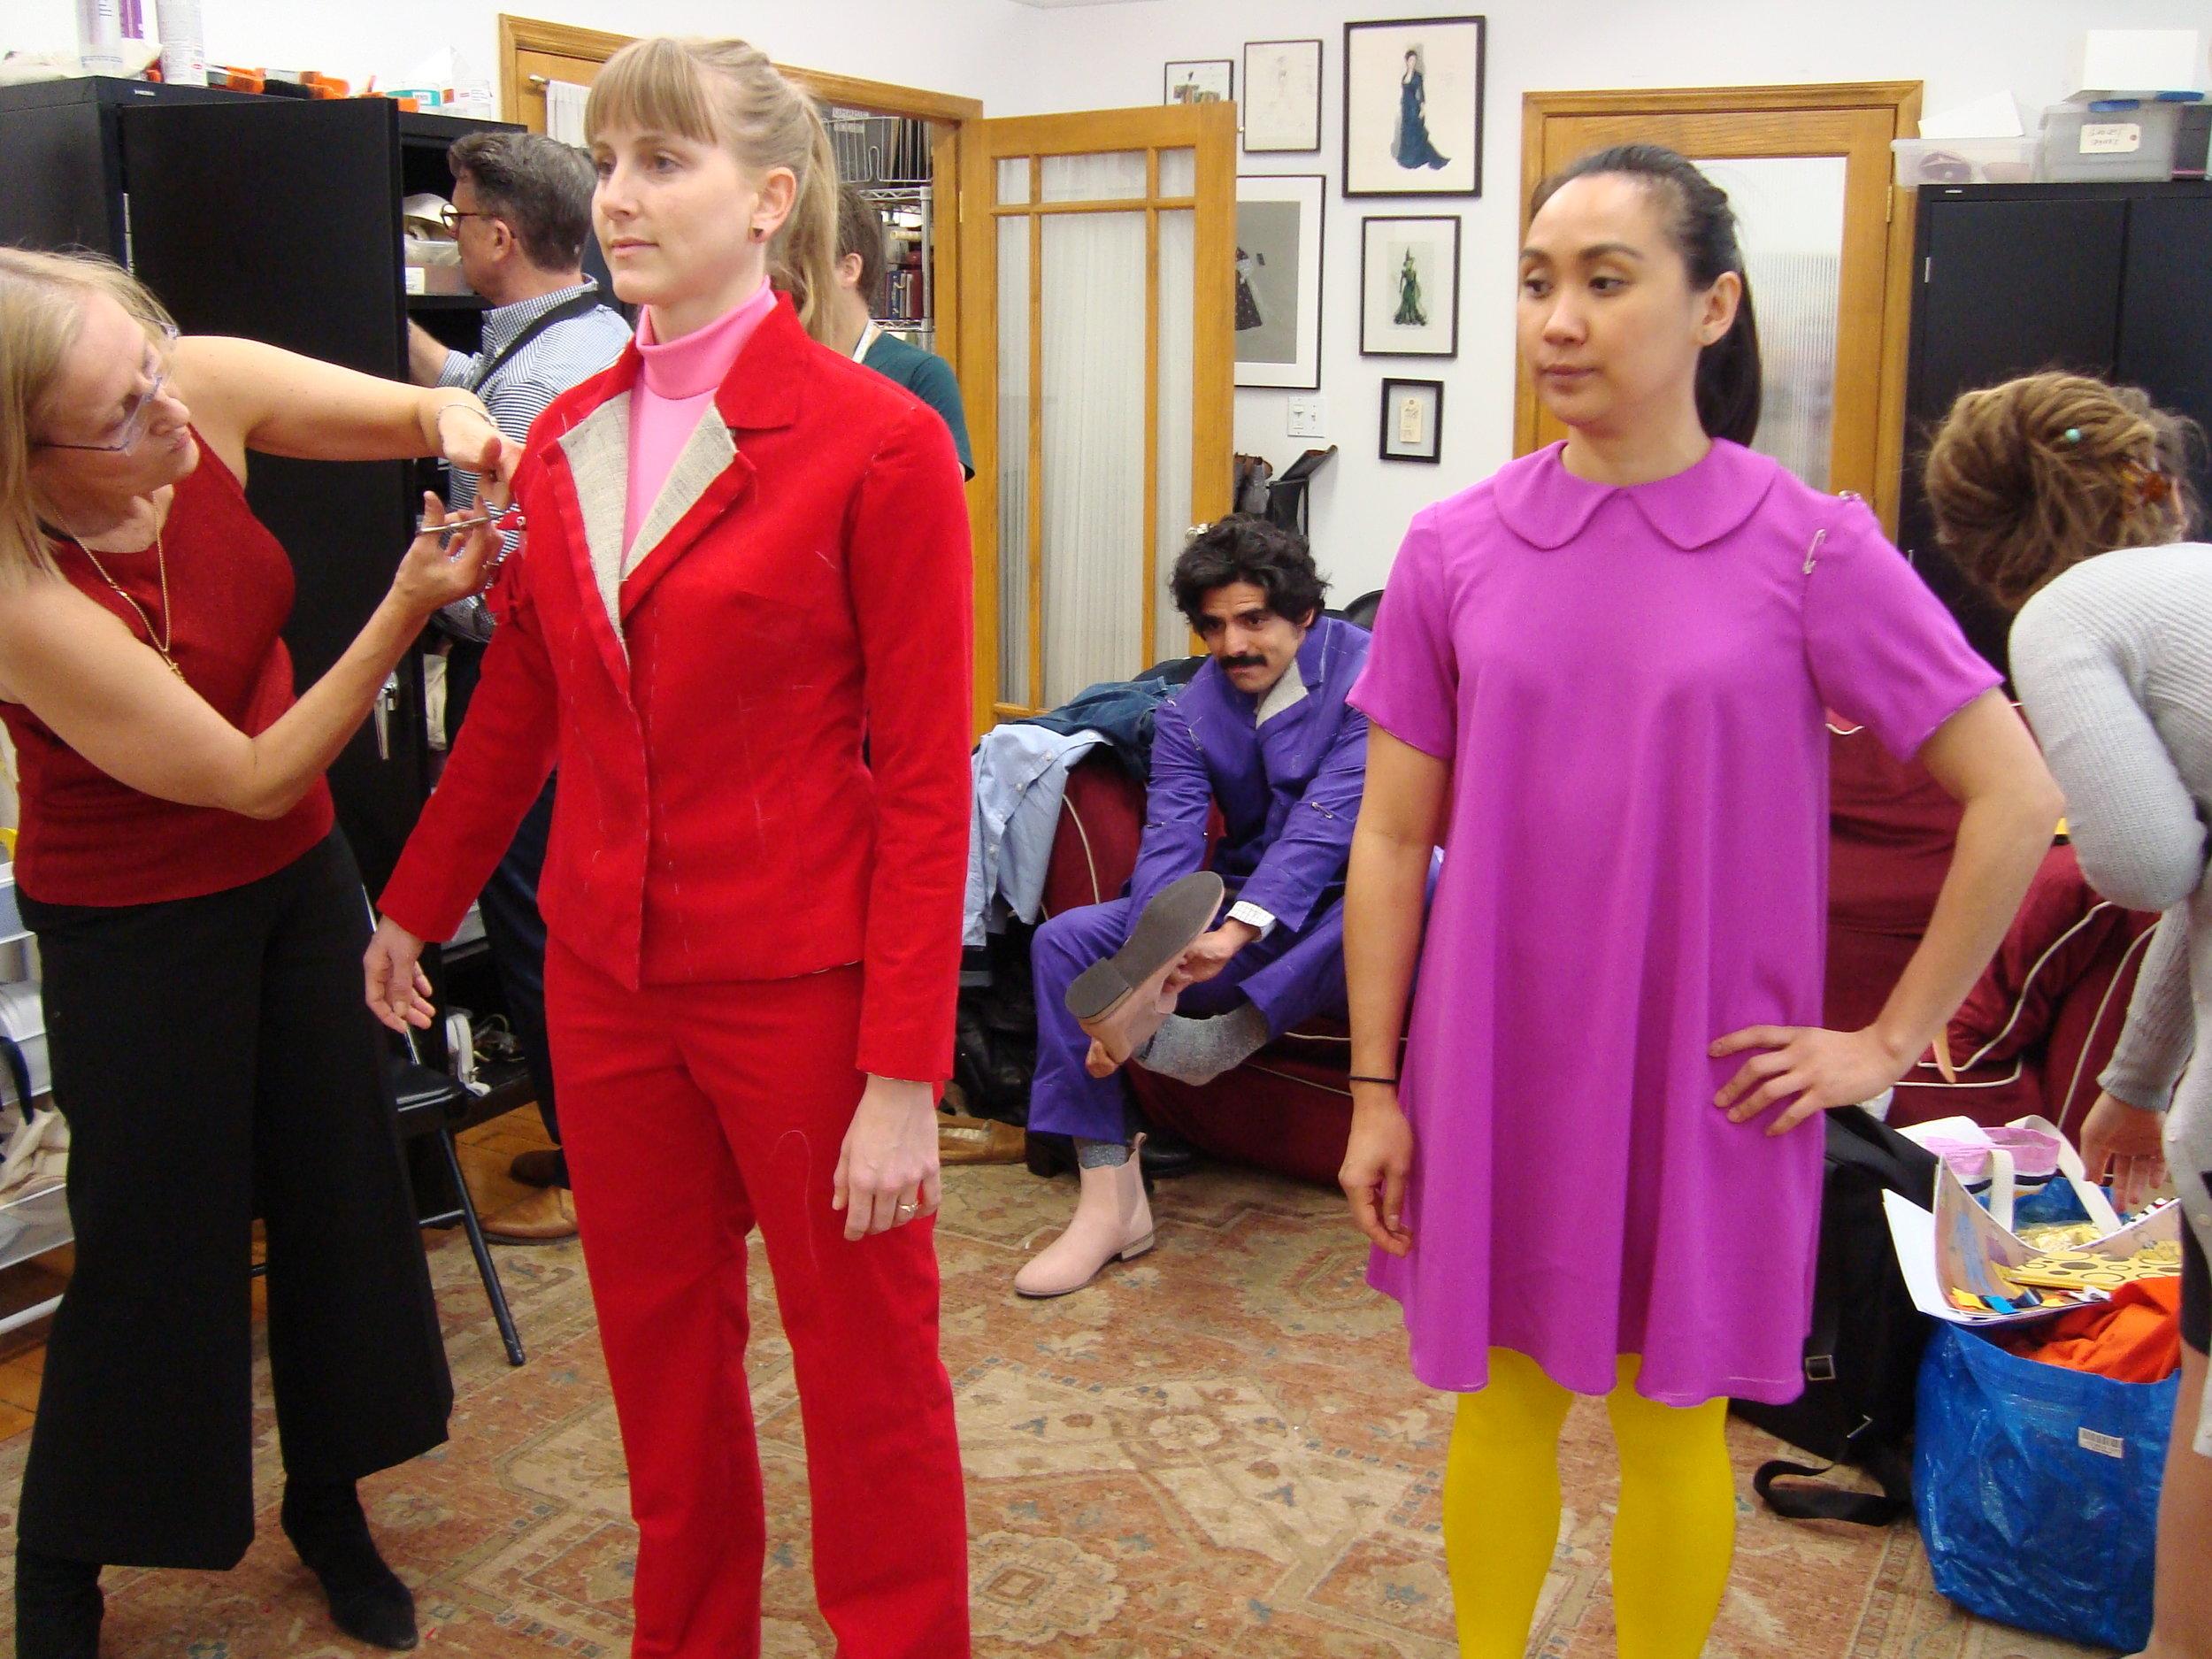 Pepperland Costume Fitting_Apr 18 2017_Stephanie Sleeper - 8255.JPG